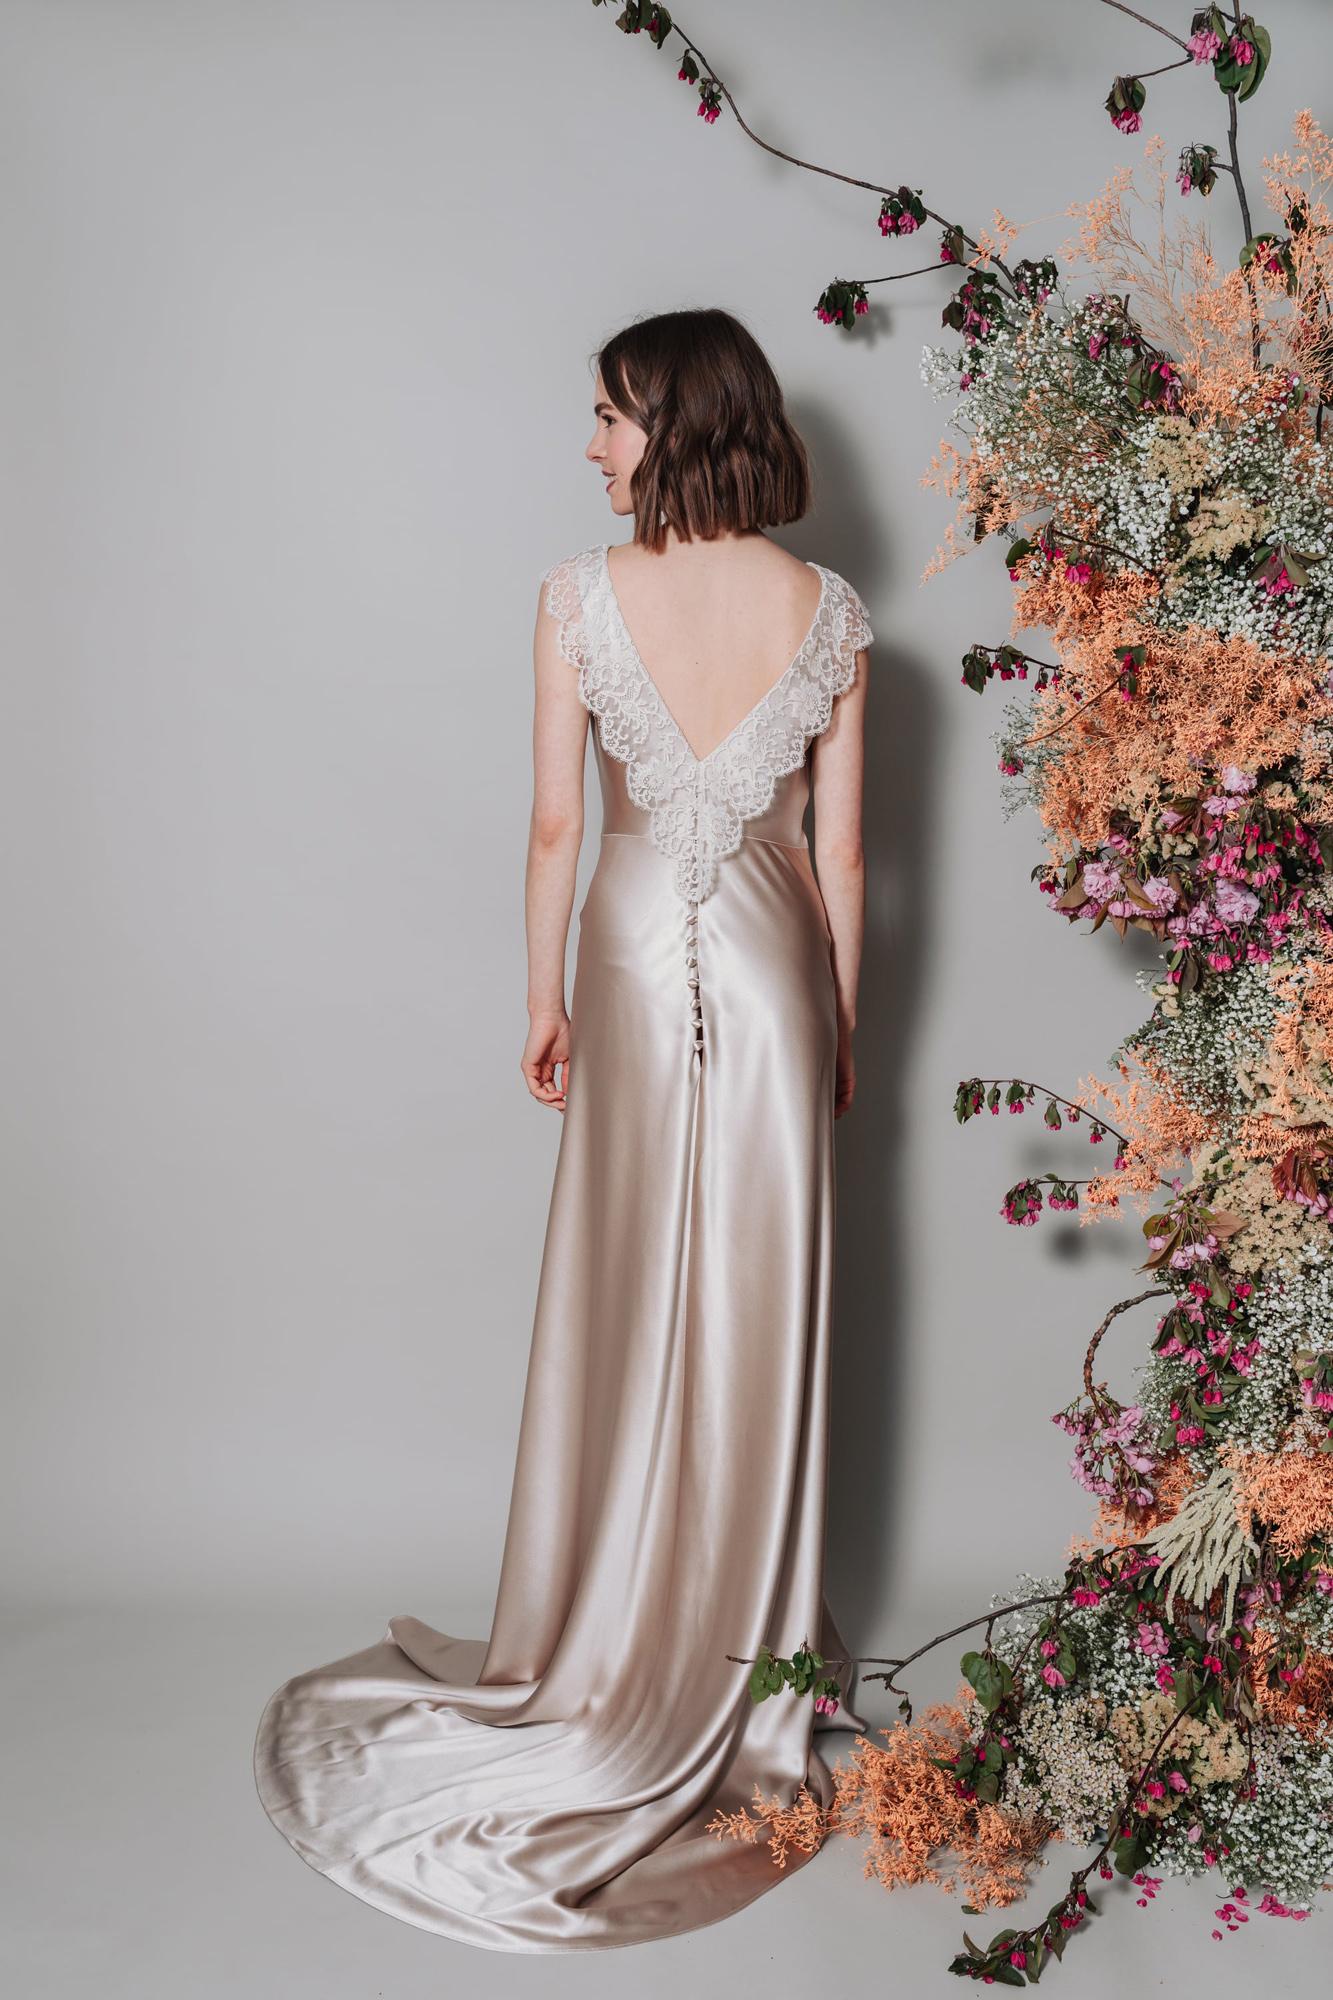 Kate-Beaumont-Sheffield-Honeysuckle-Bias-Cut-Silk-Panelled-Wedding-Gown-16.jpg